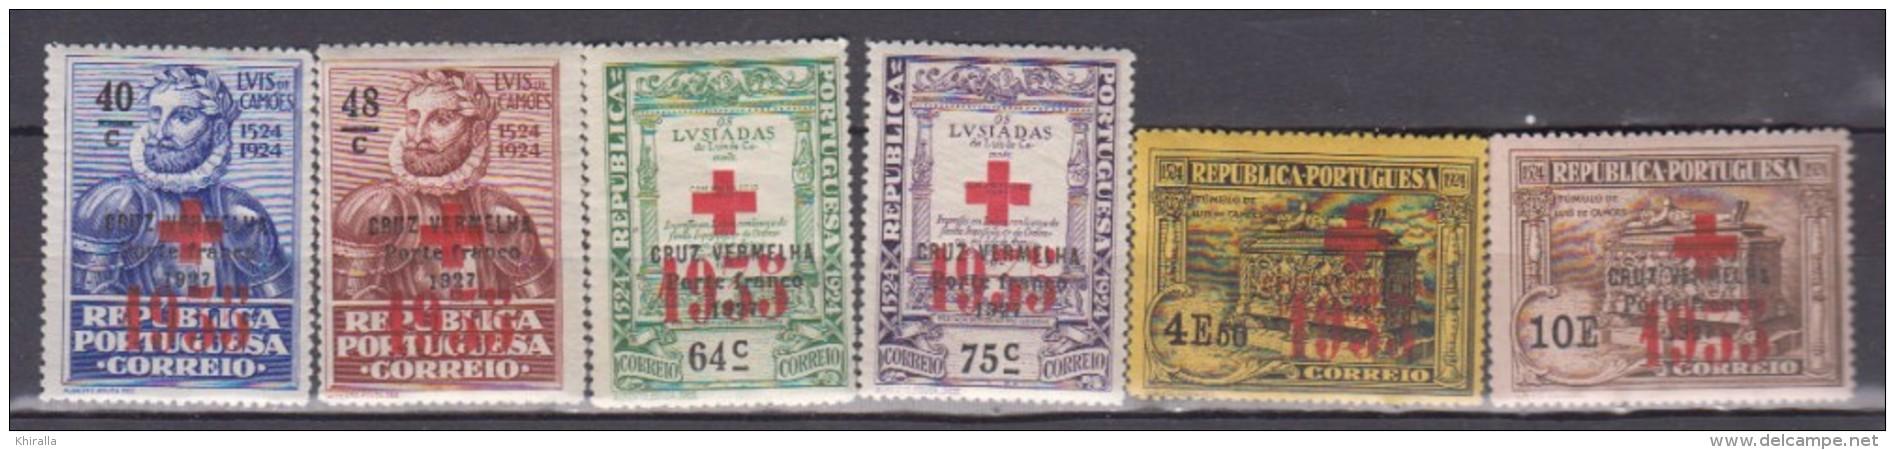 PORTUGAL    1934     Franchise     N.   79 / 84   COTE    18 . 00  EUROS          ( M 195 ) - Neufs